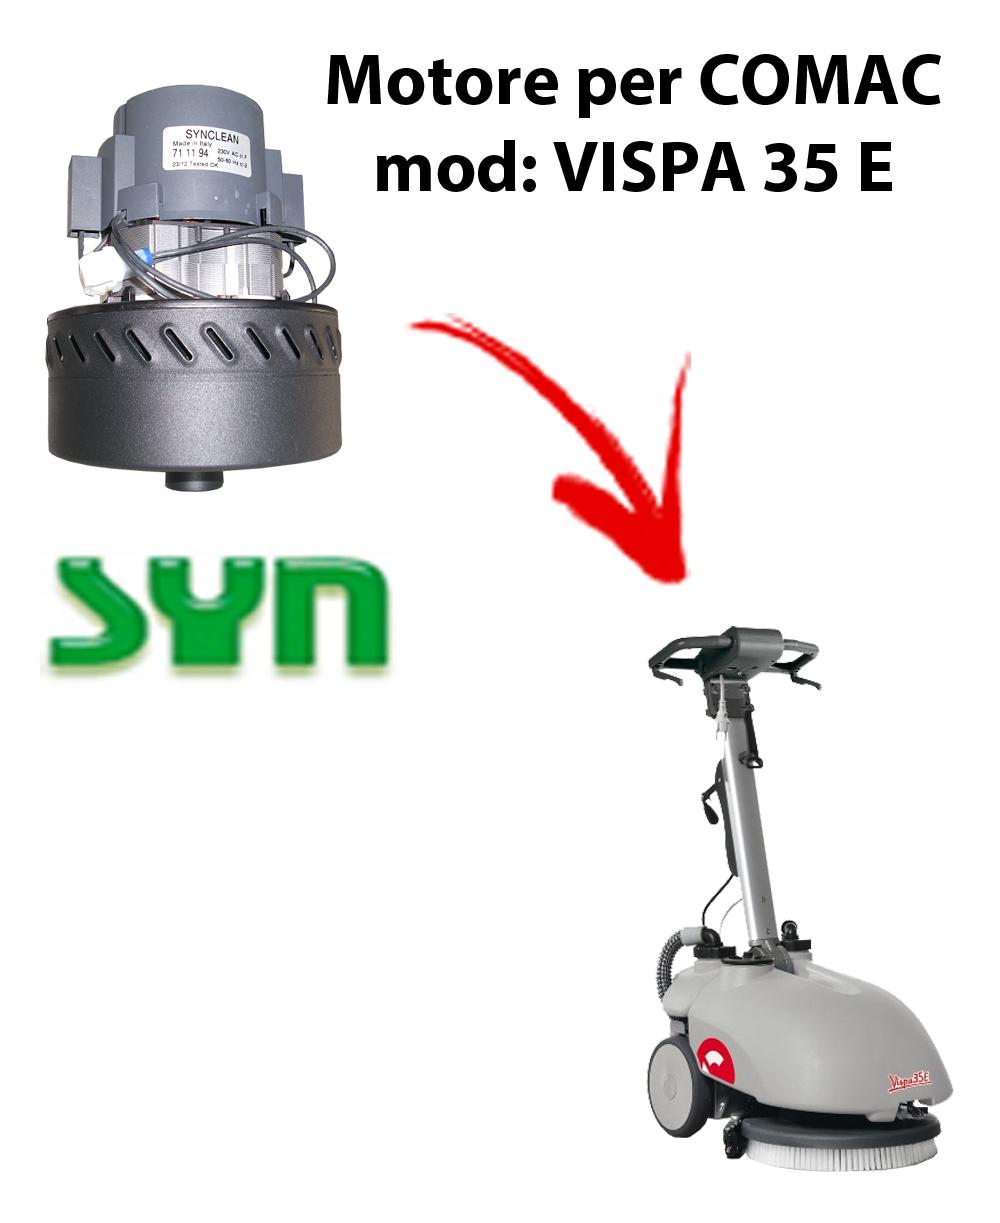 VISPA 35 E Vacuum motor SY N for scrubber dryer Comac